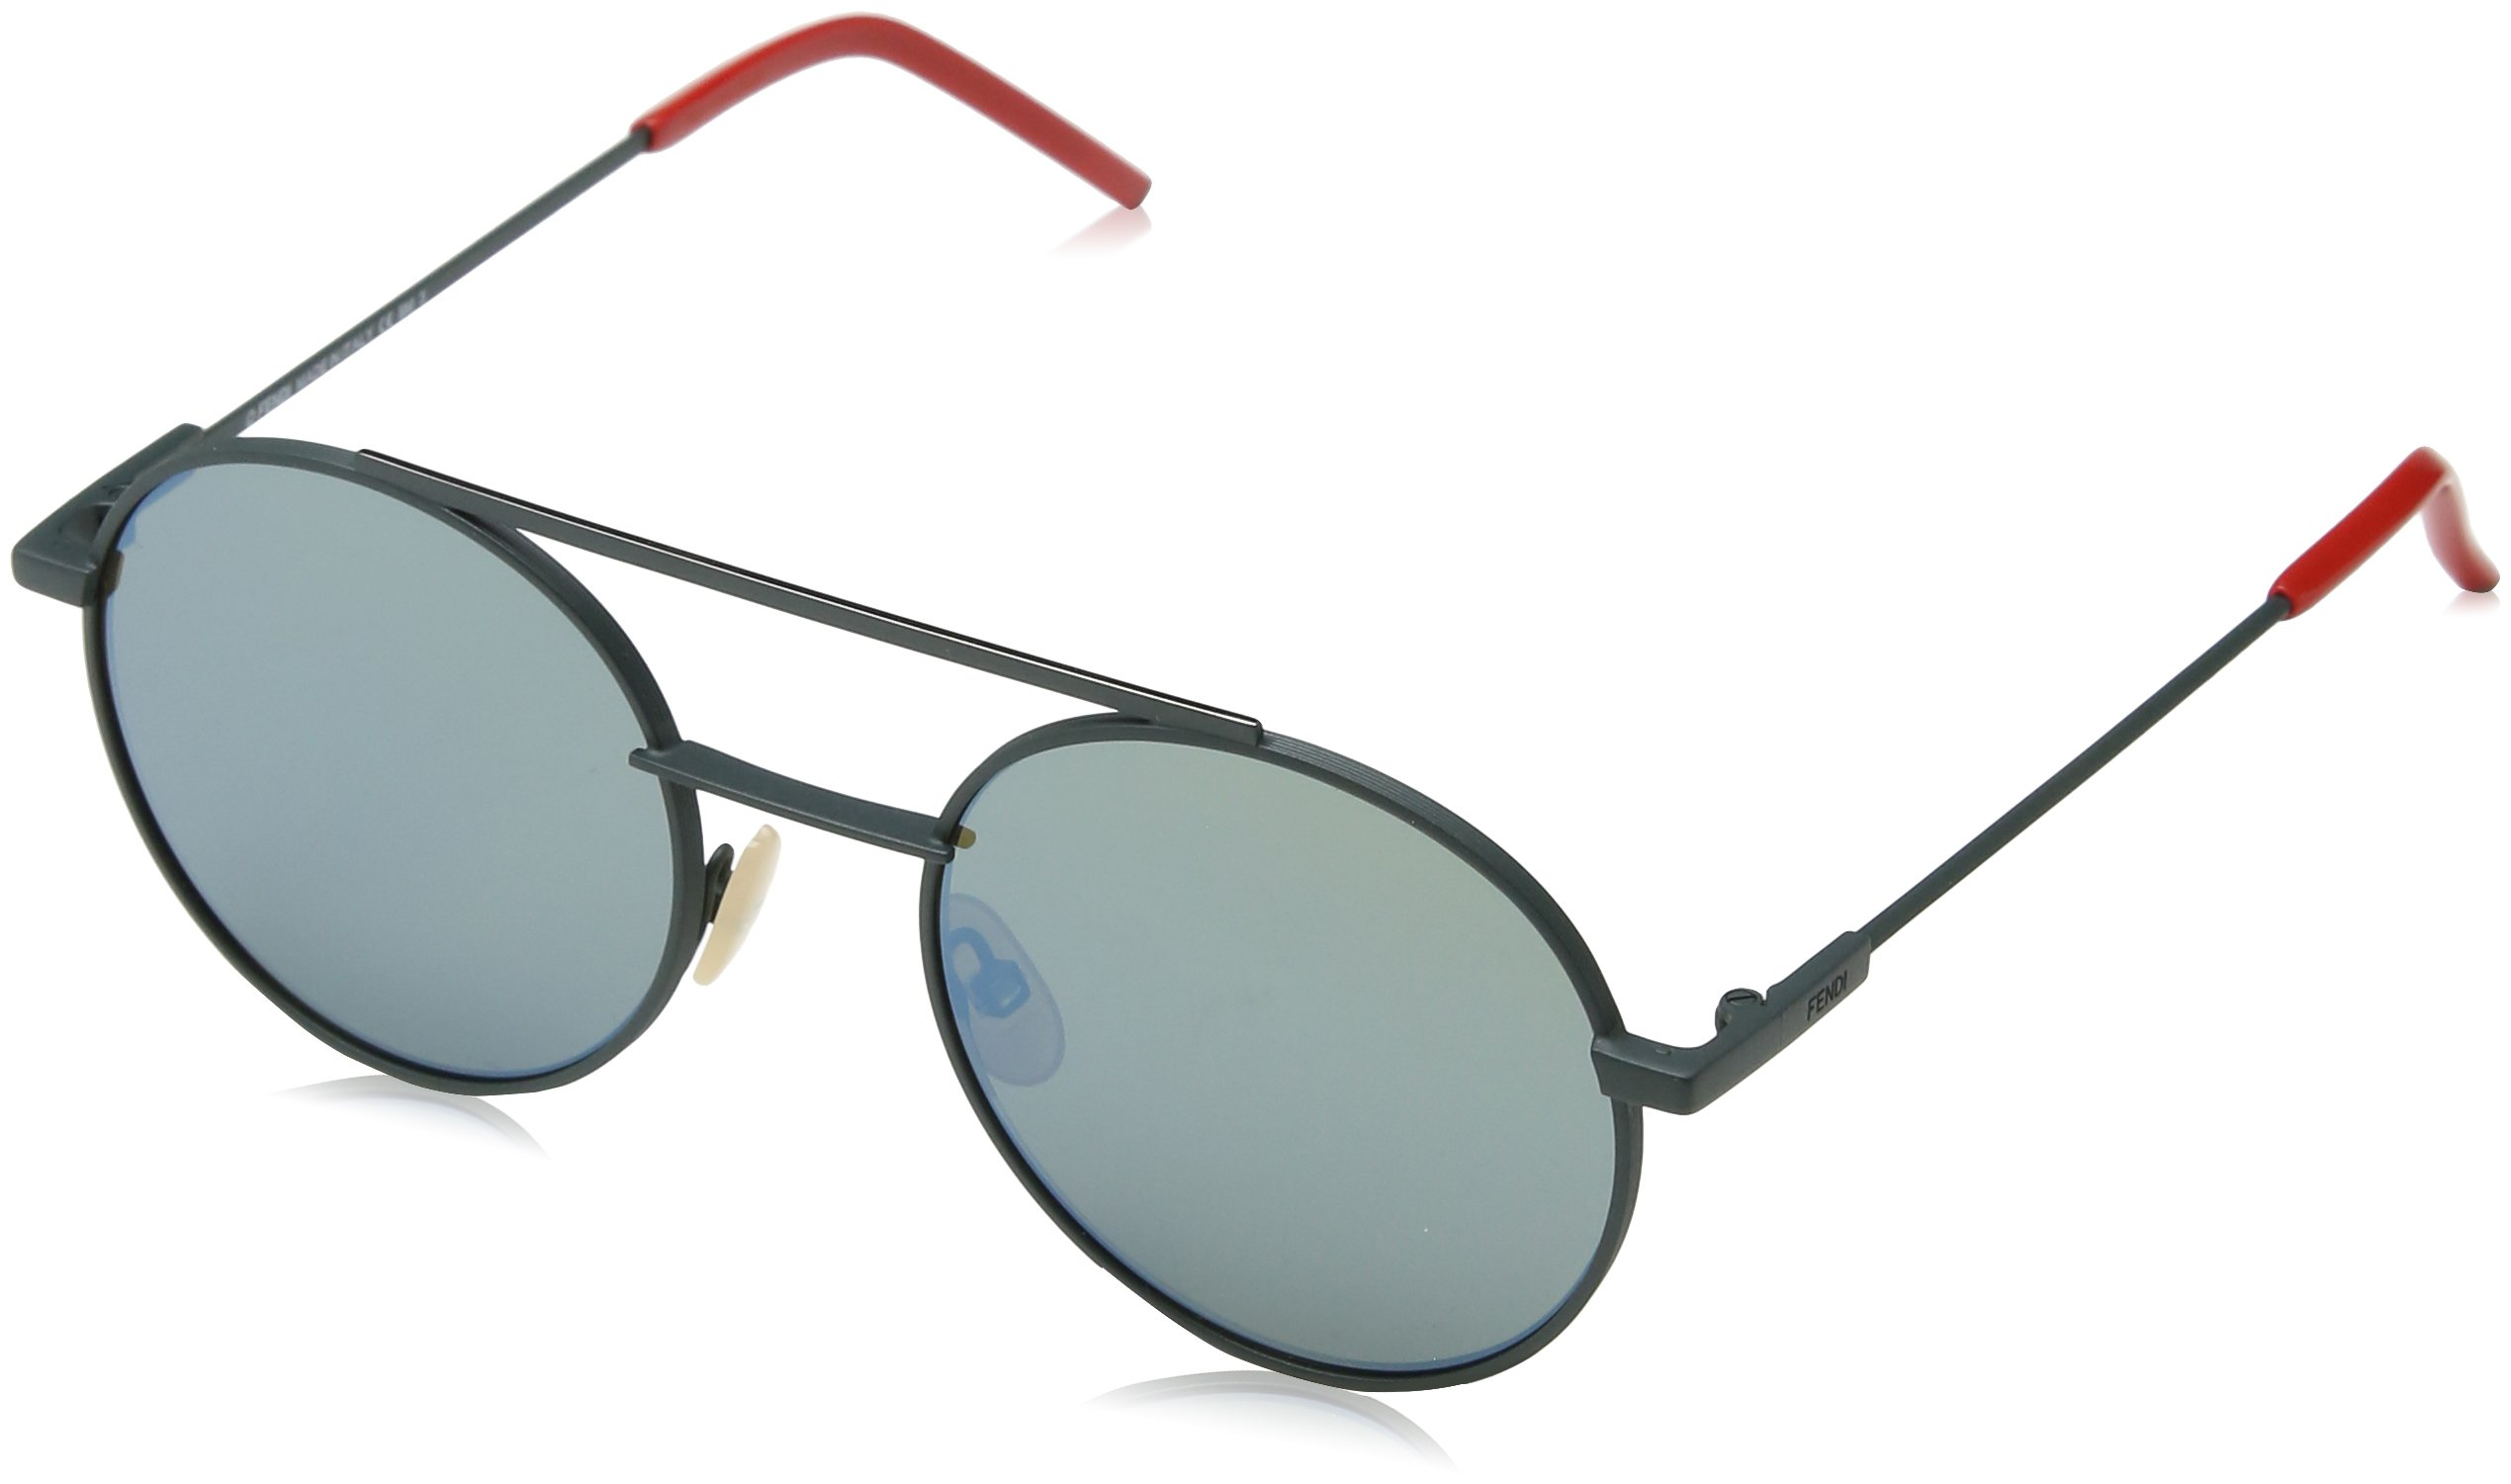 974314f85f3 Sunglasses Fendi 221  S 01ED Green   3U khaki mirror blue lens